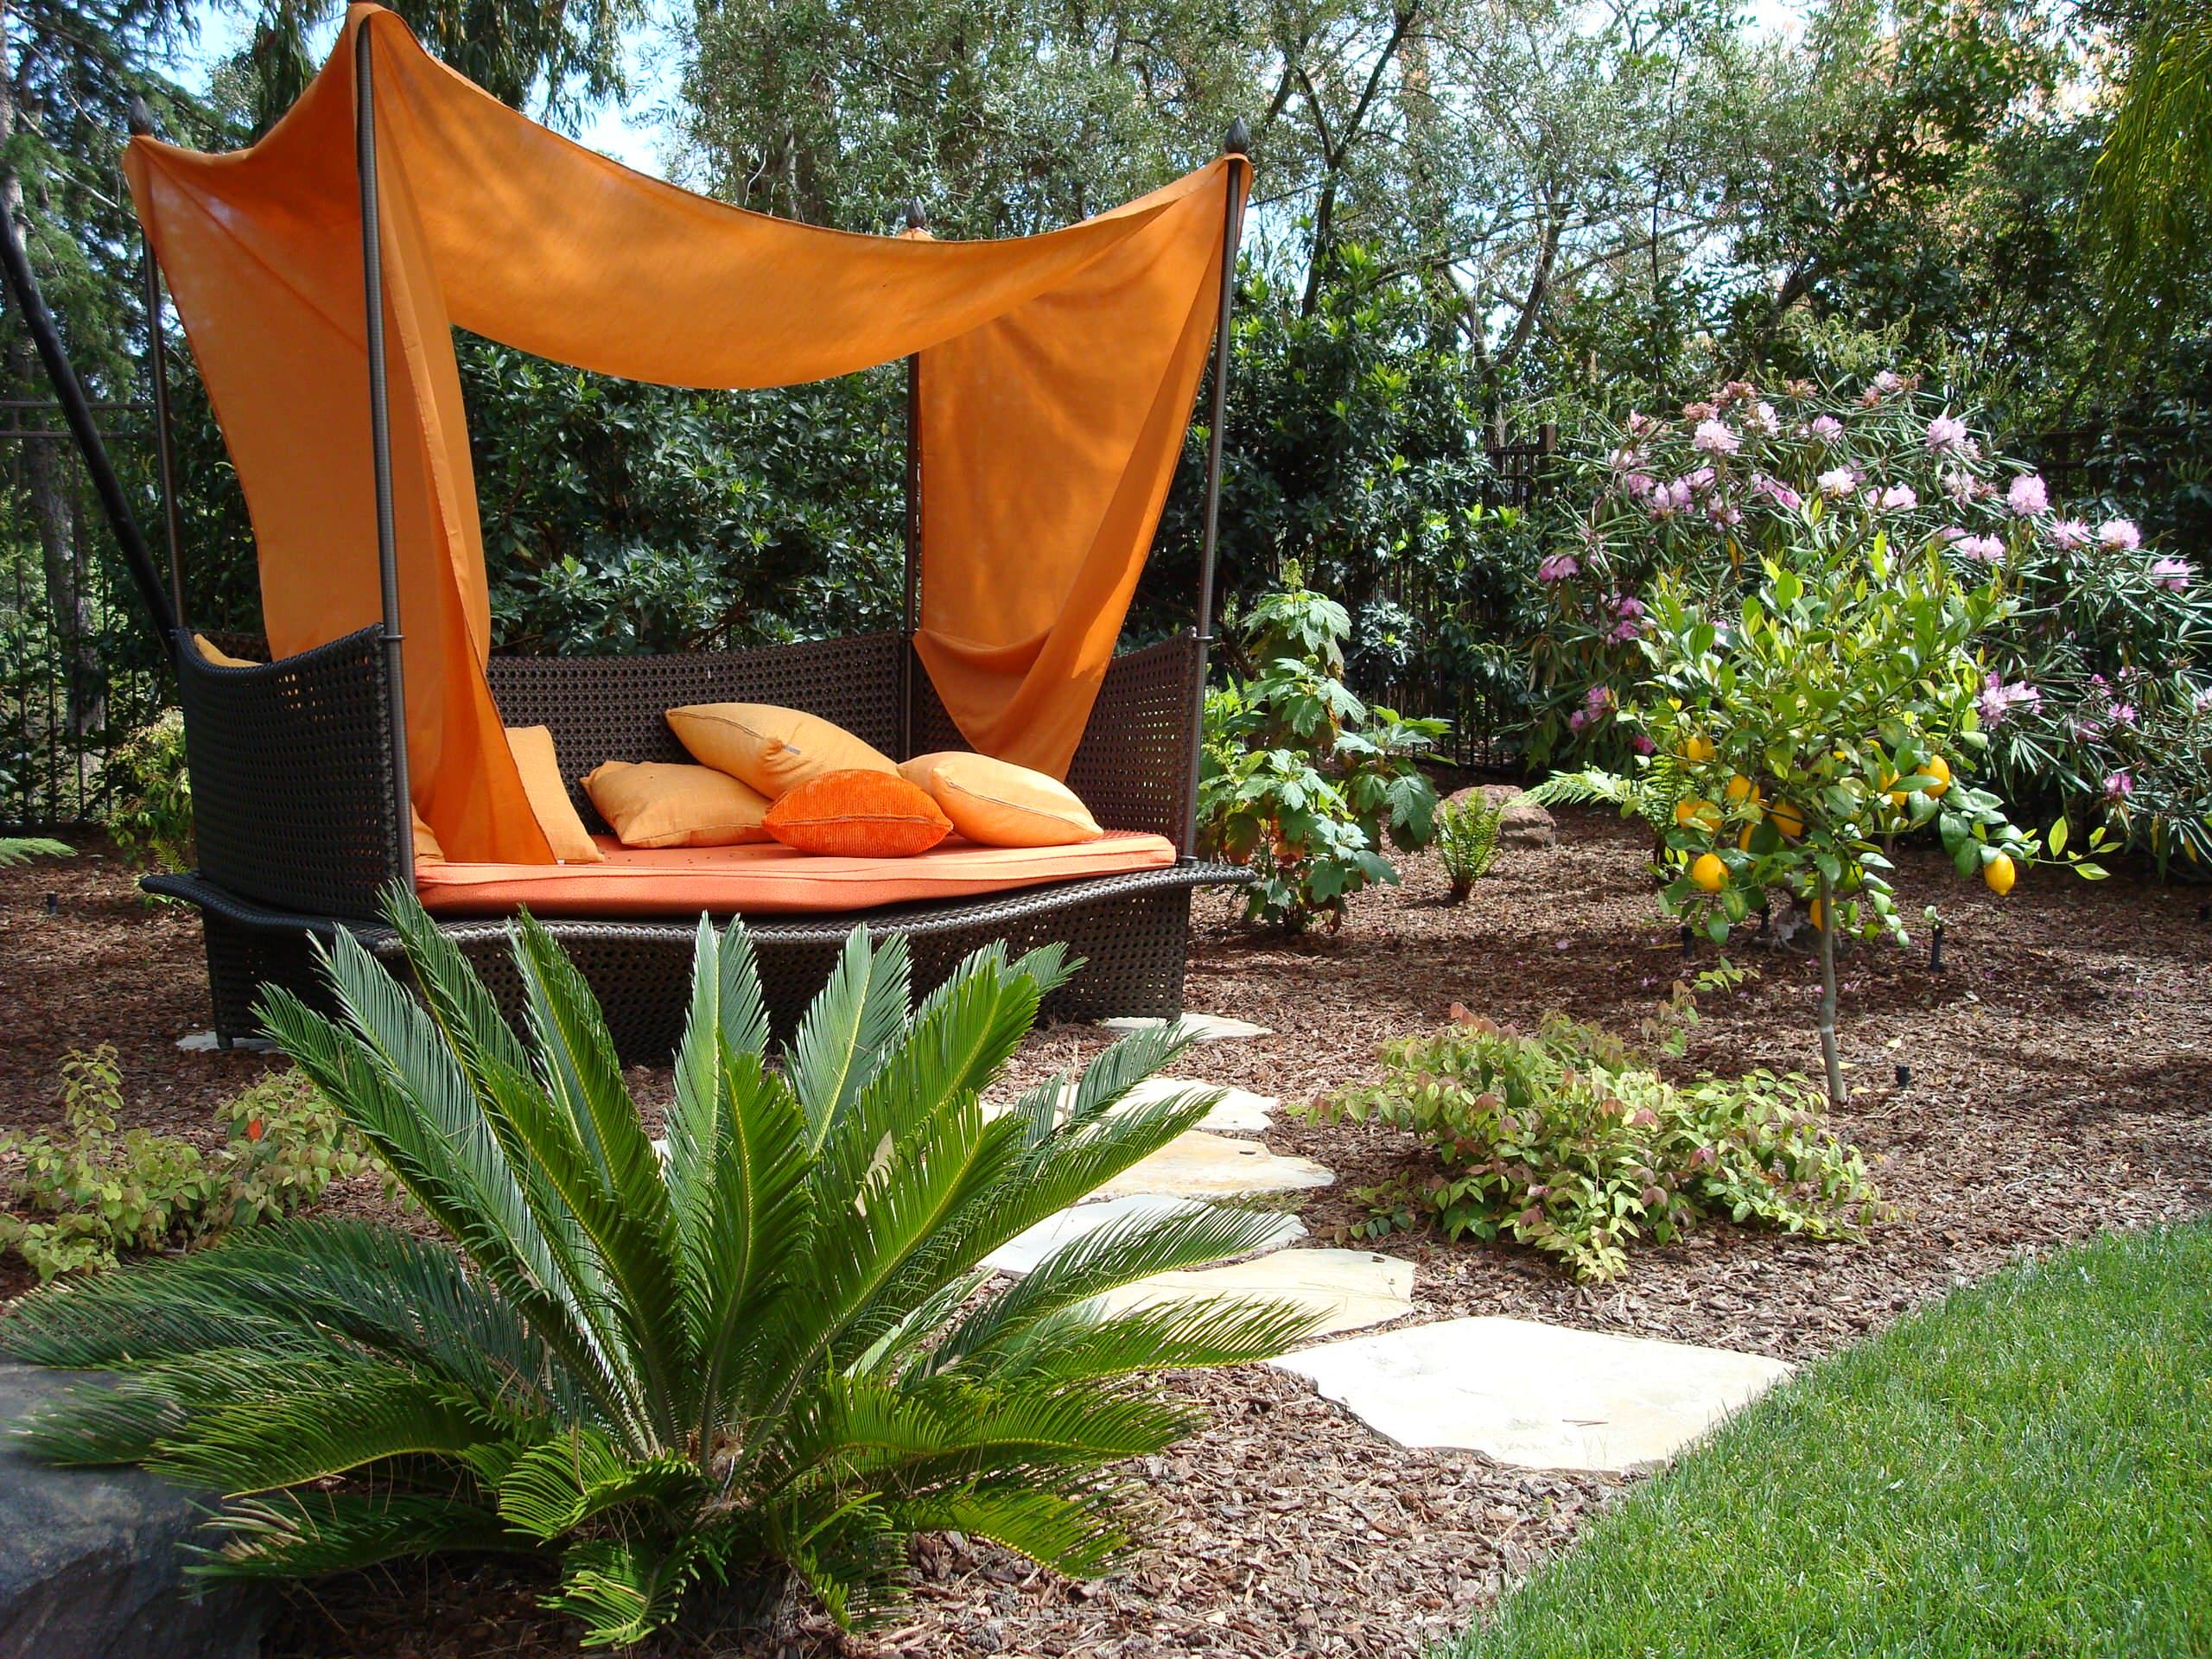 16 Delightful Modern Landscape Ideas That Will Update Your ... on Small Landscape Garden Ideas id=39110